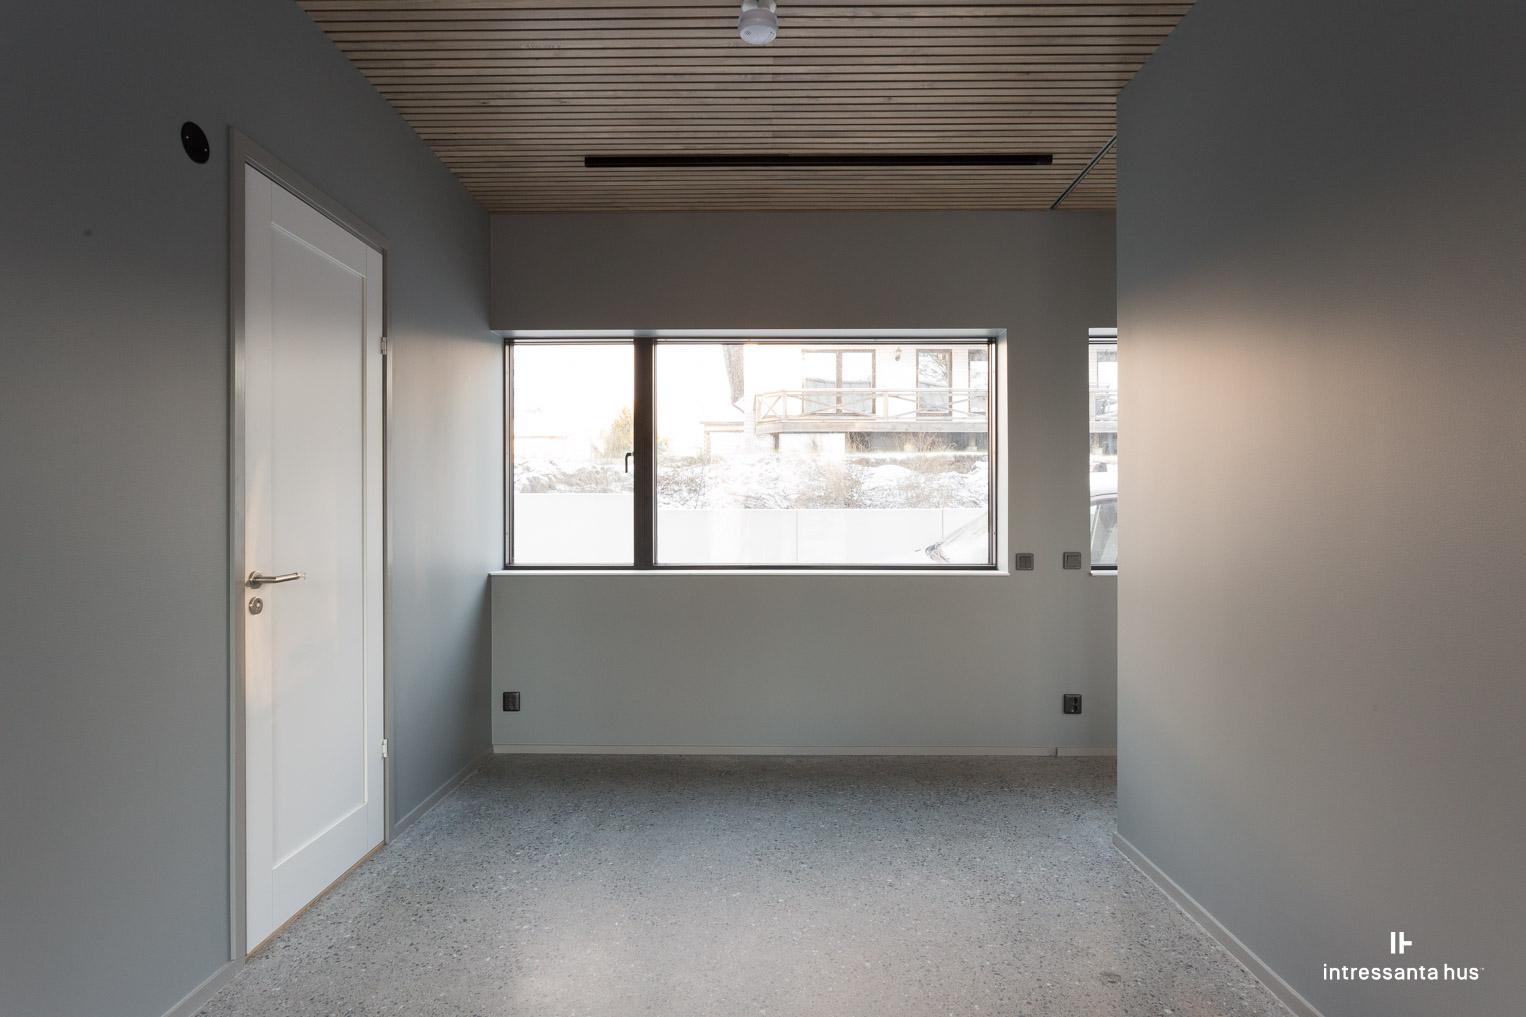 intressantahus-house1-072